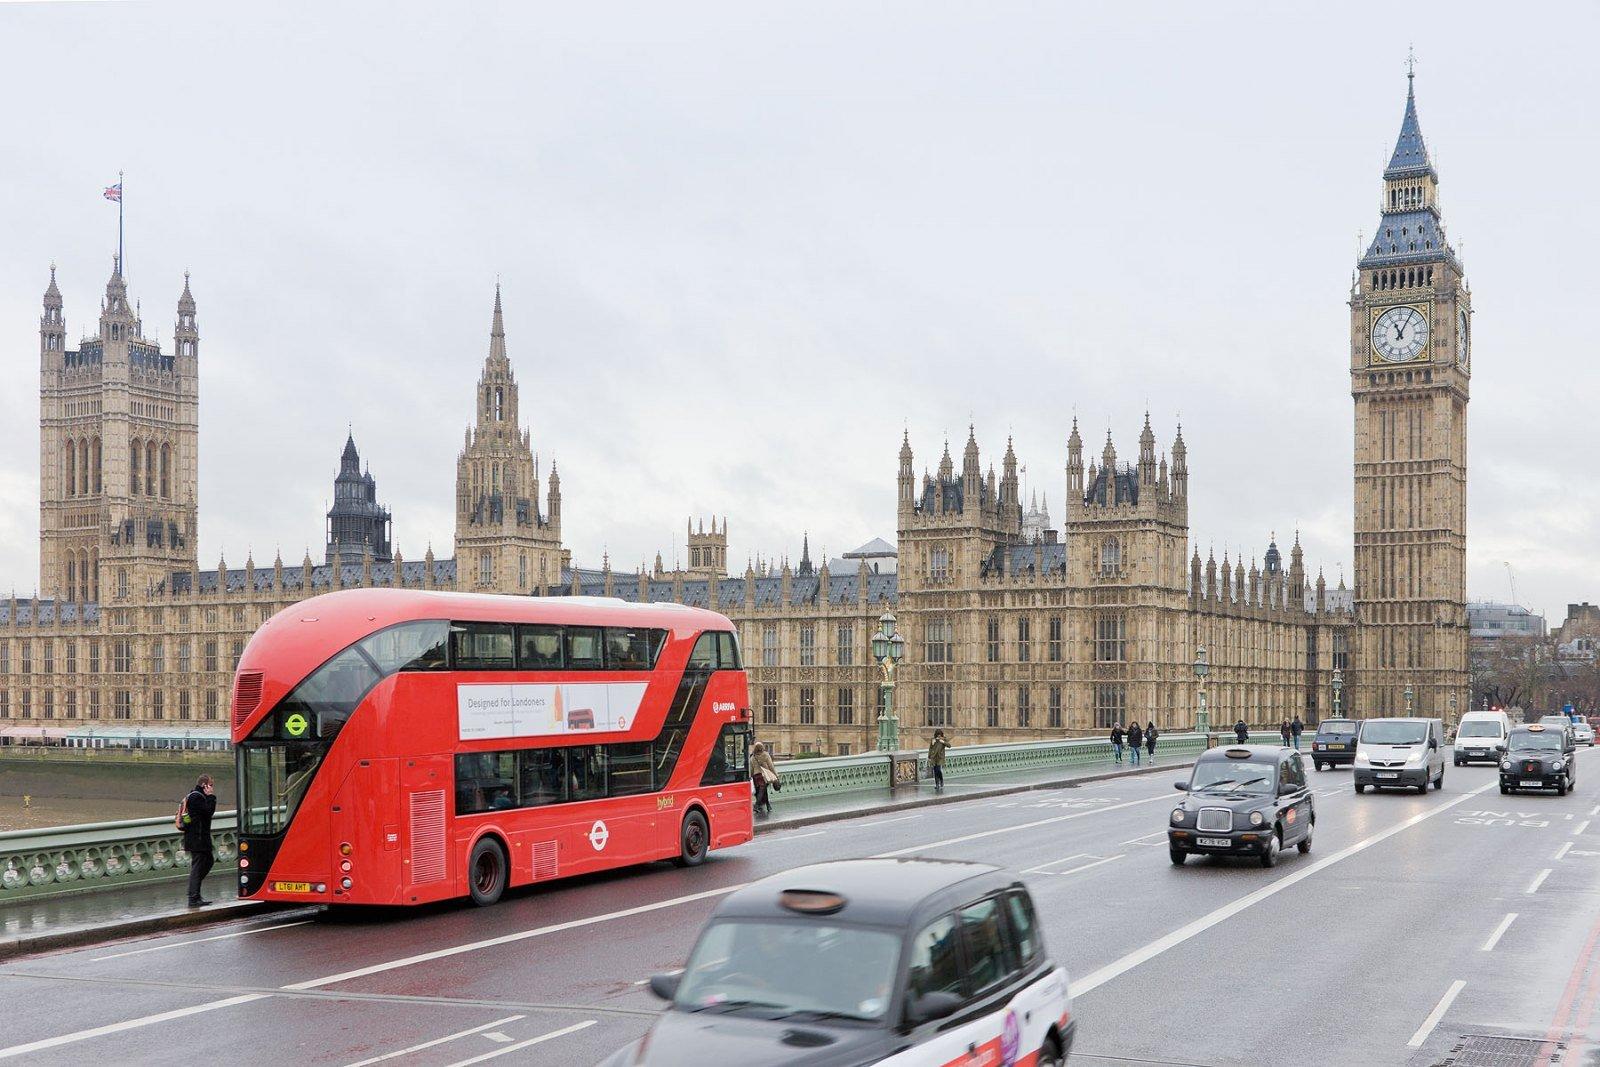 autobus-moderno-de-londres